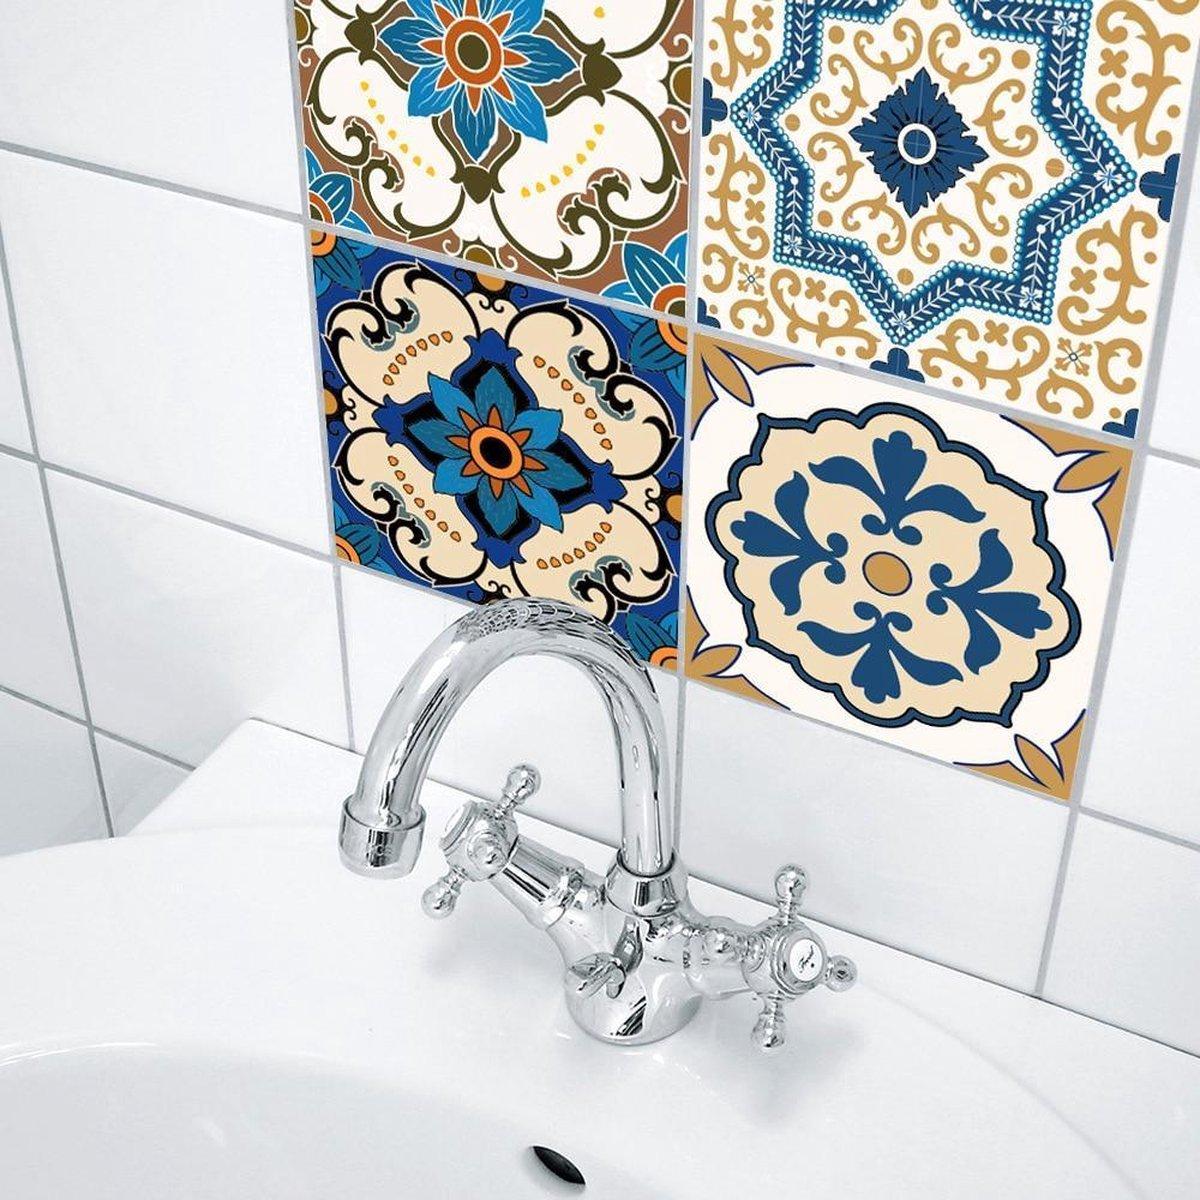 Bol Com 3d Sticker Decoratie Marokkaanse Tegels Pvc Waterdichte Zelfklevende Behang Meubels